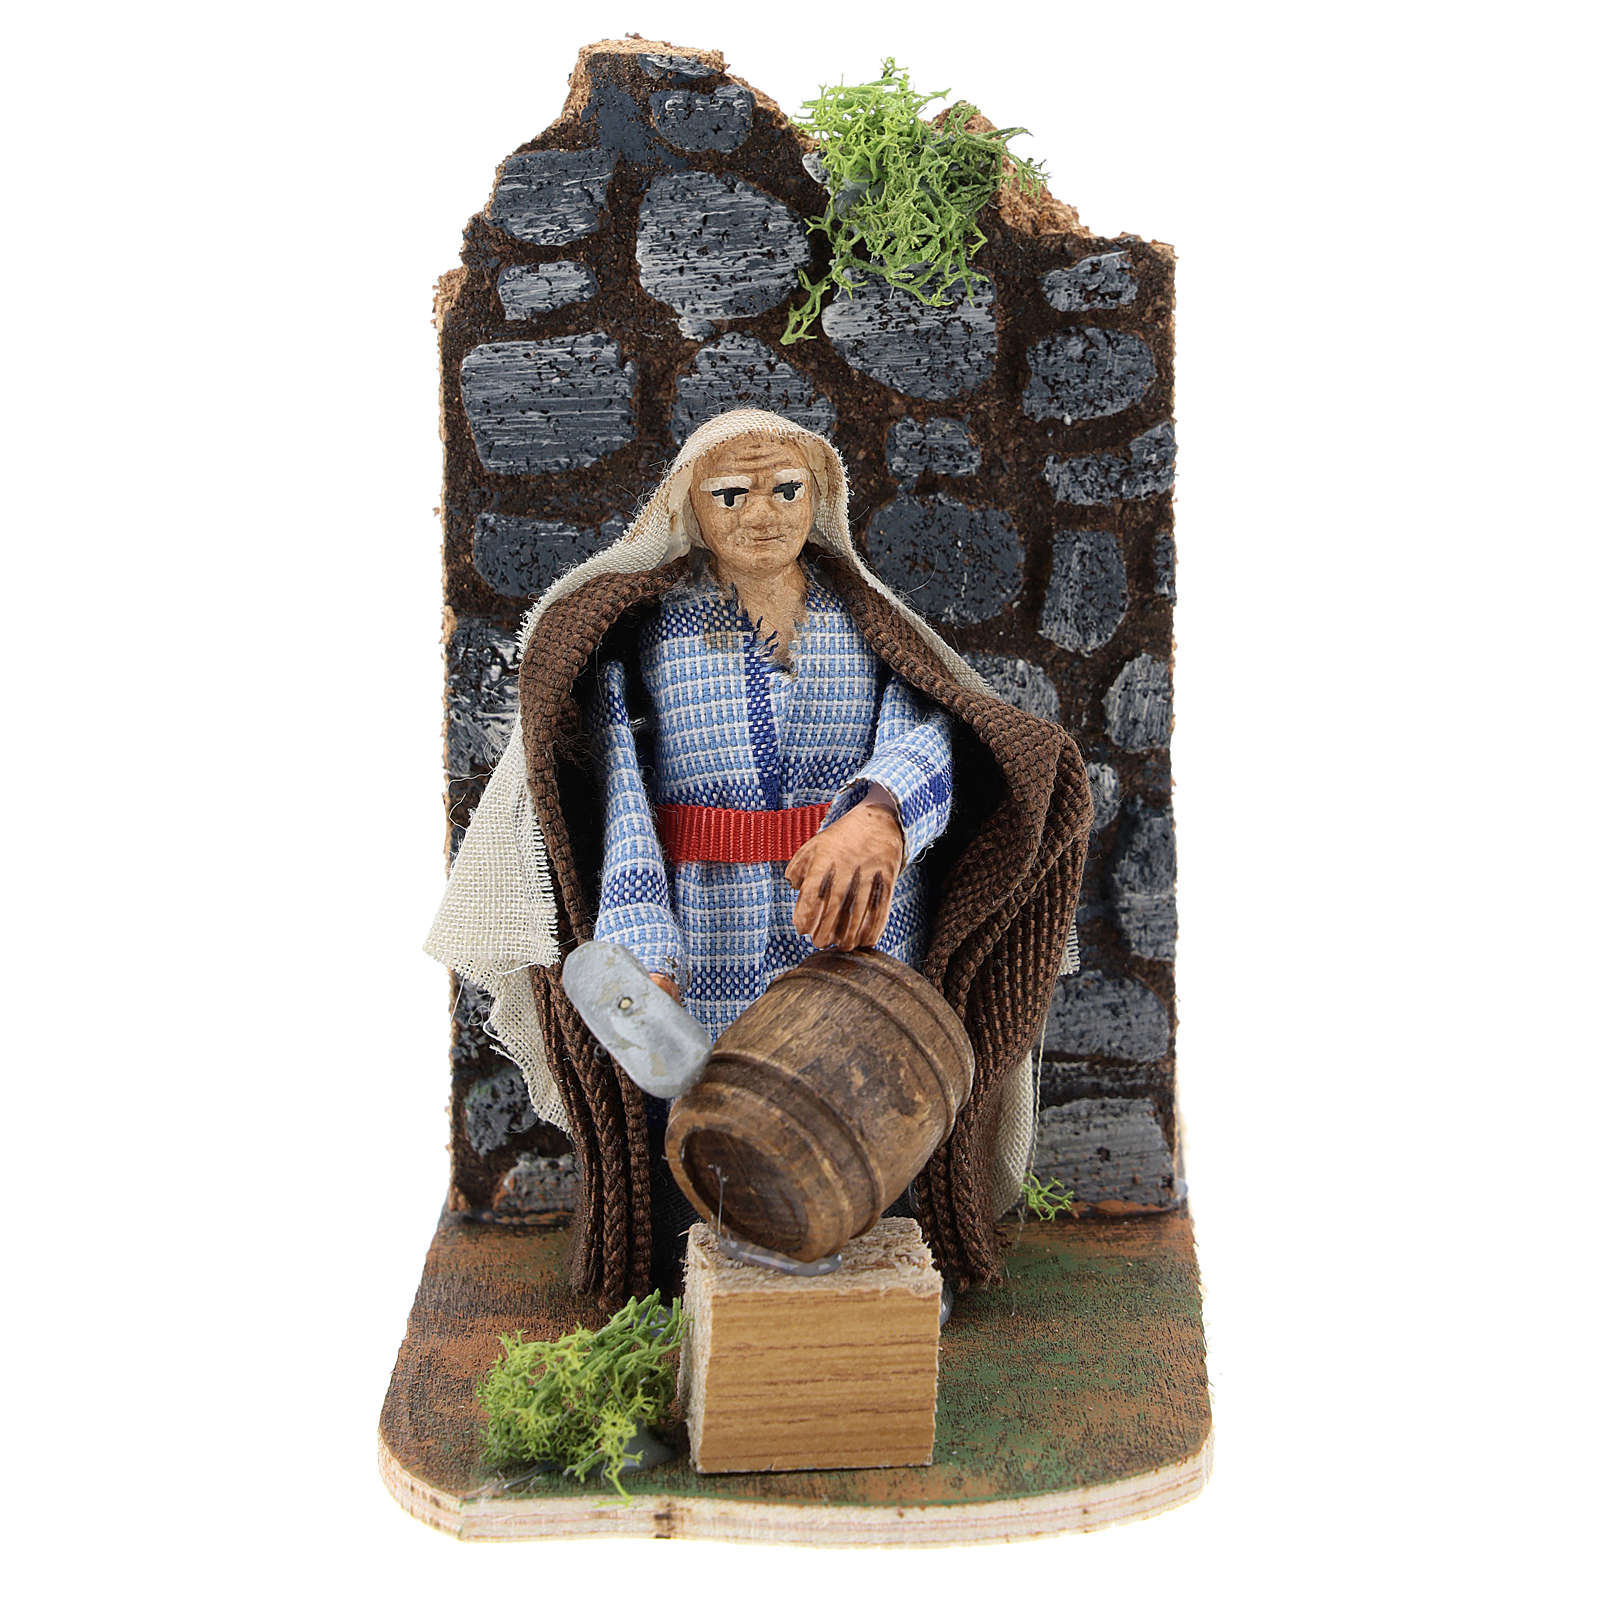 Man repairing casks, 7 cm animated Neapolitan nativity 4